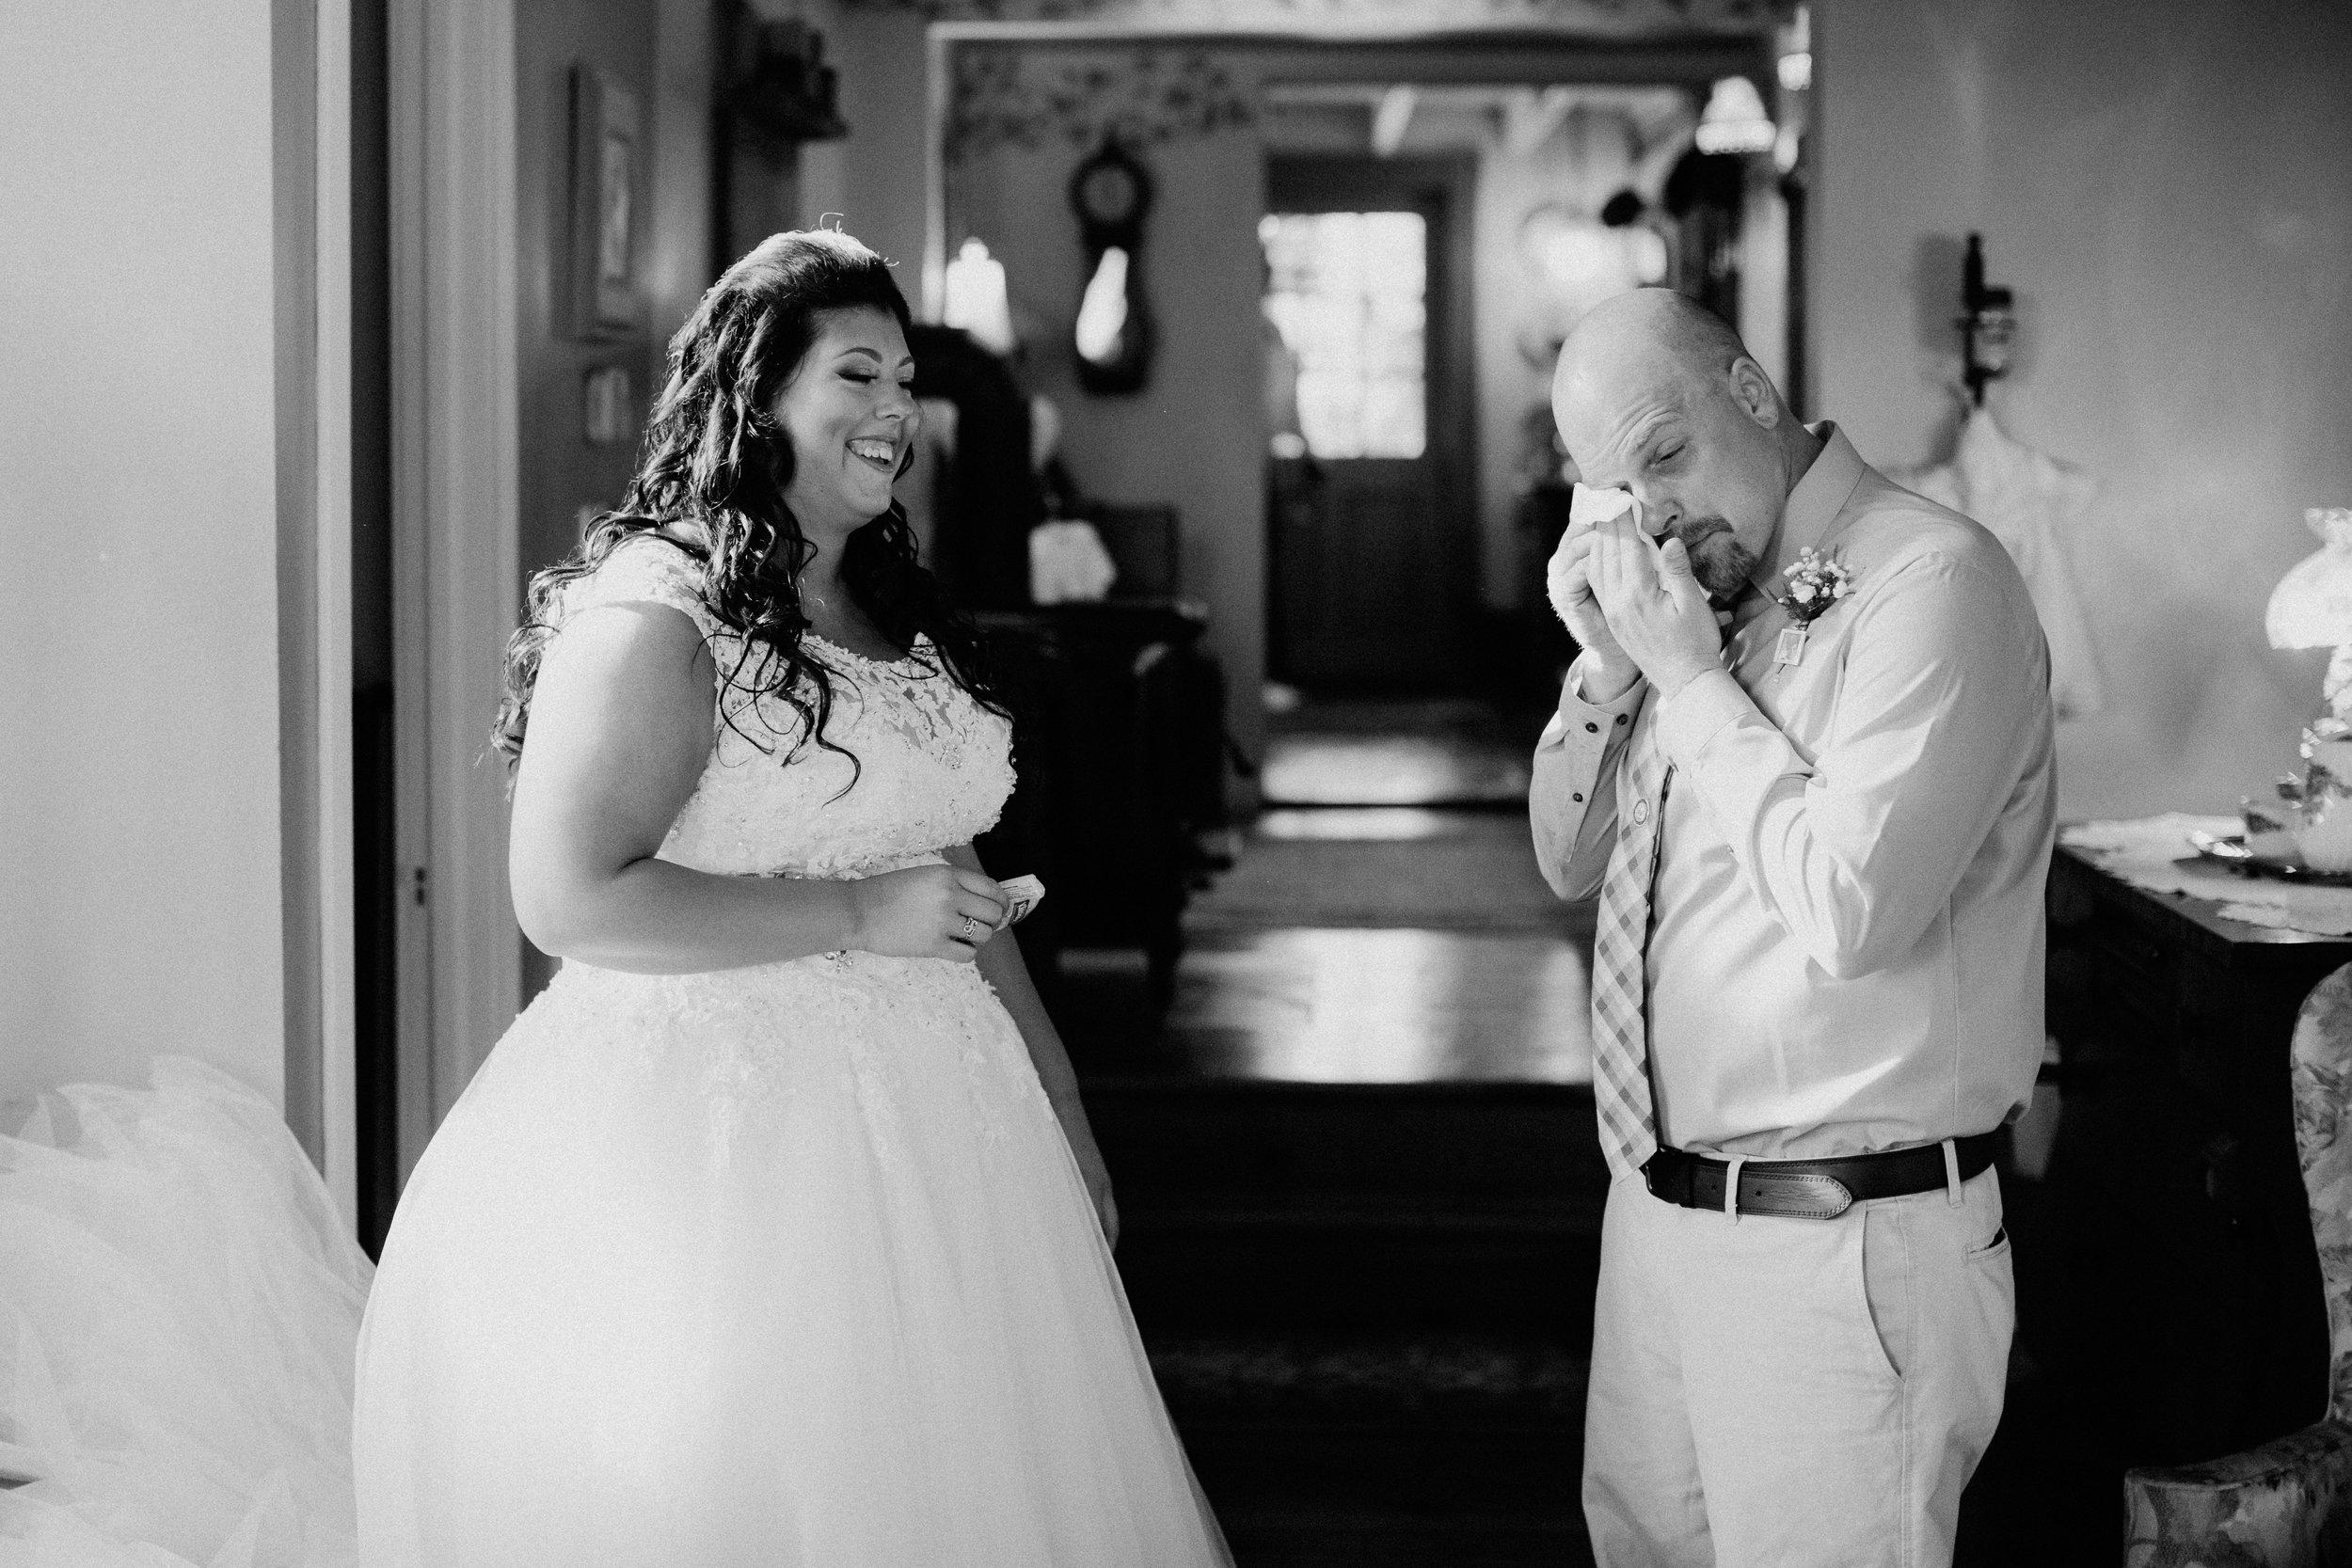 Sorella Farms_Lynchburg Wedding Photographer_Lynchburg Wedding Venue_Lynchburg Photographer-19.jpg